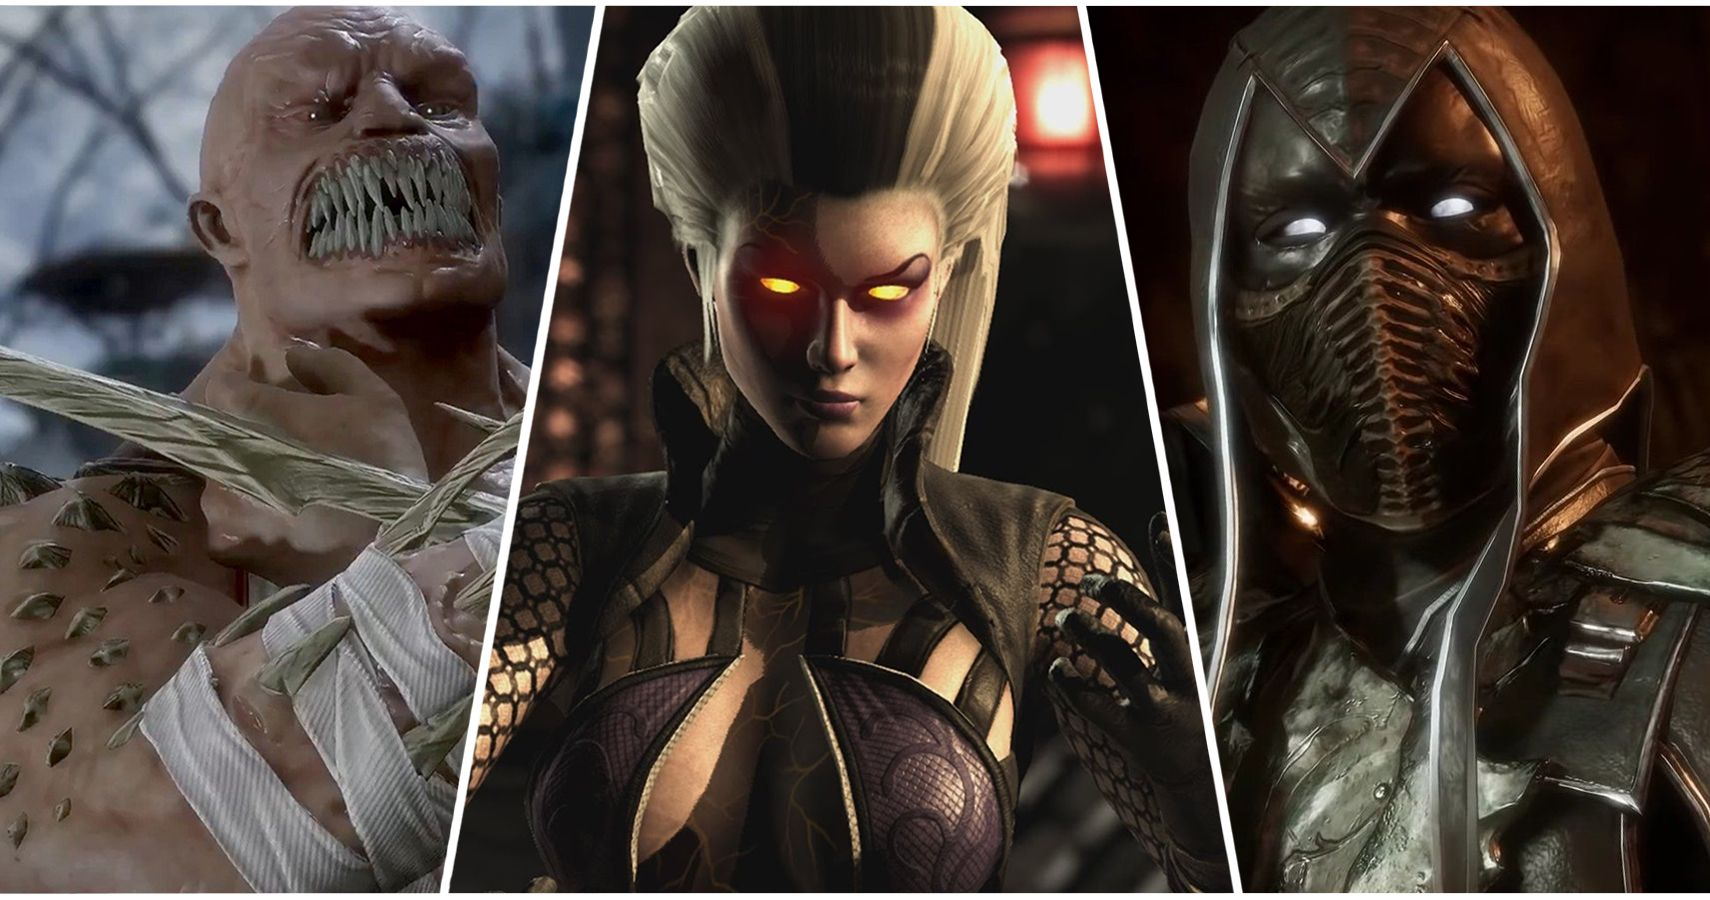 10 Characters We Hope To See In James Wan's Mortal Kombat movie